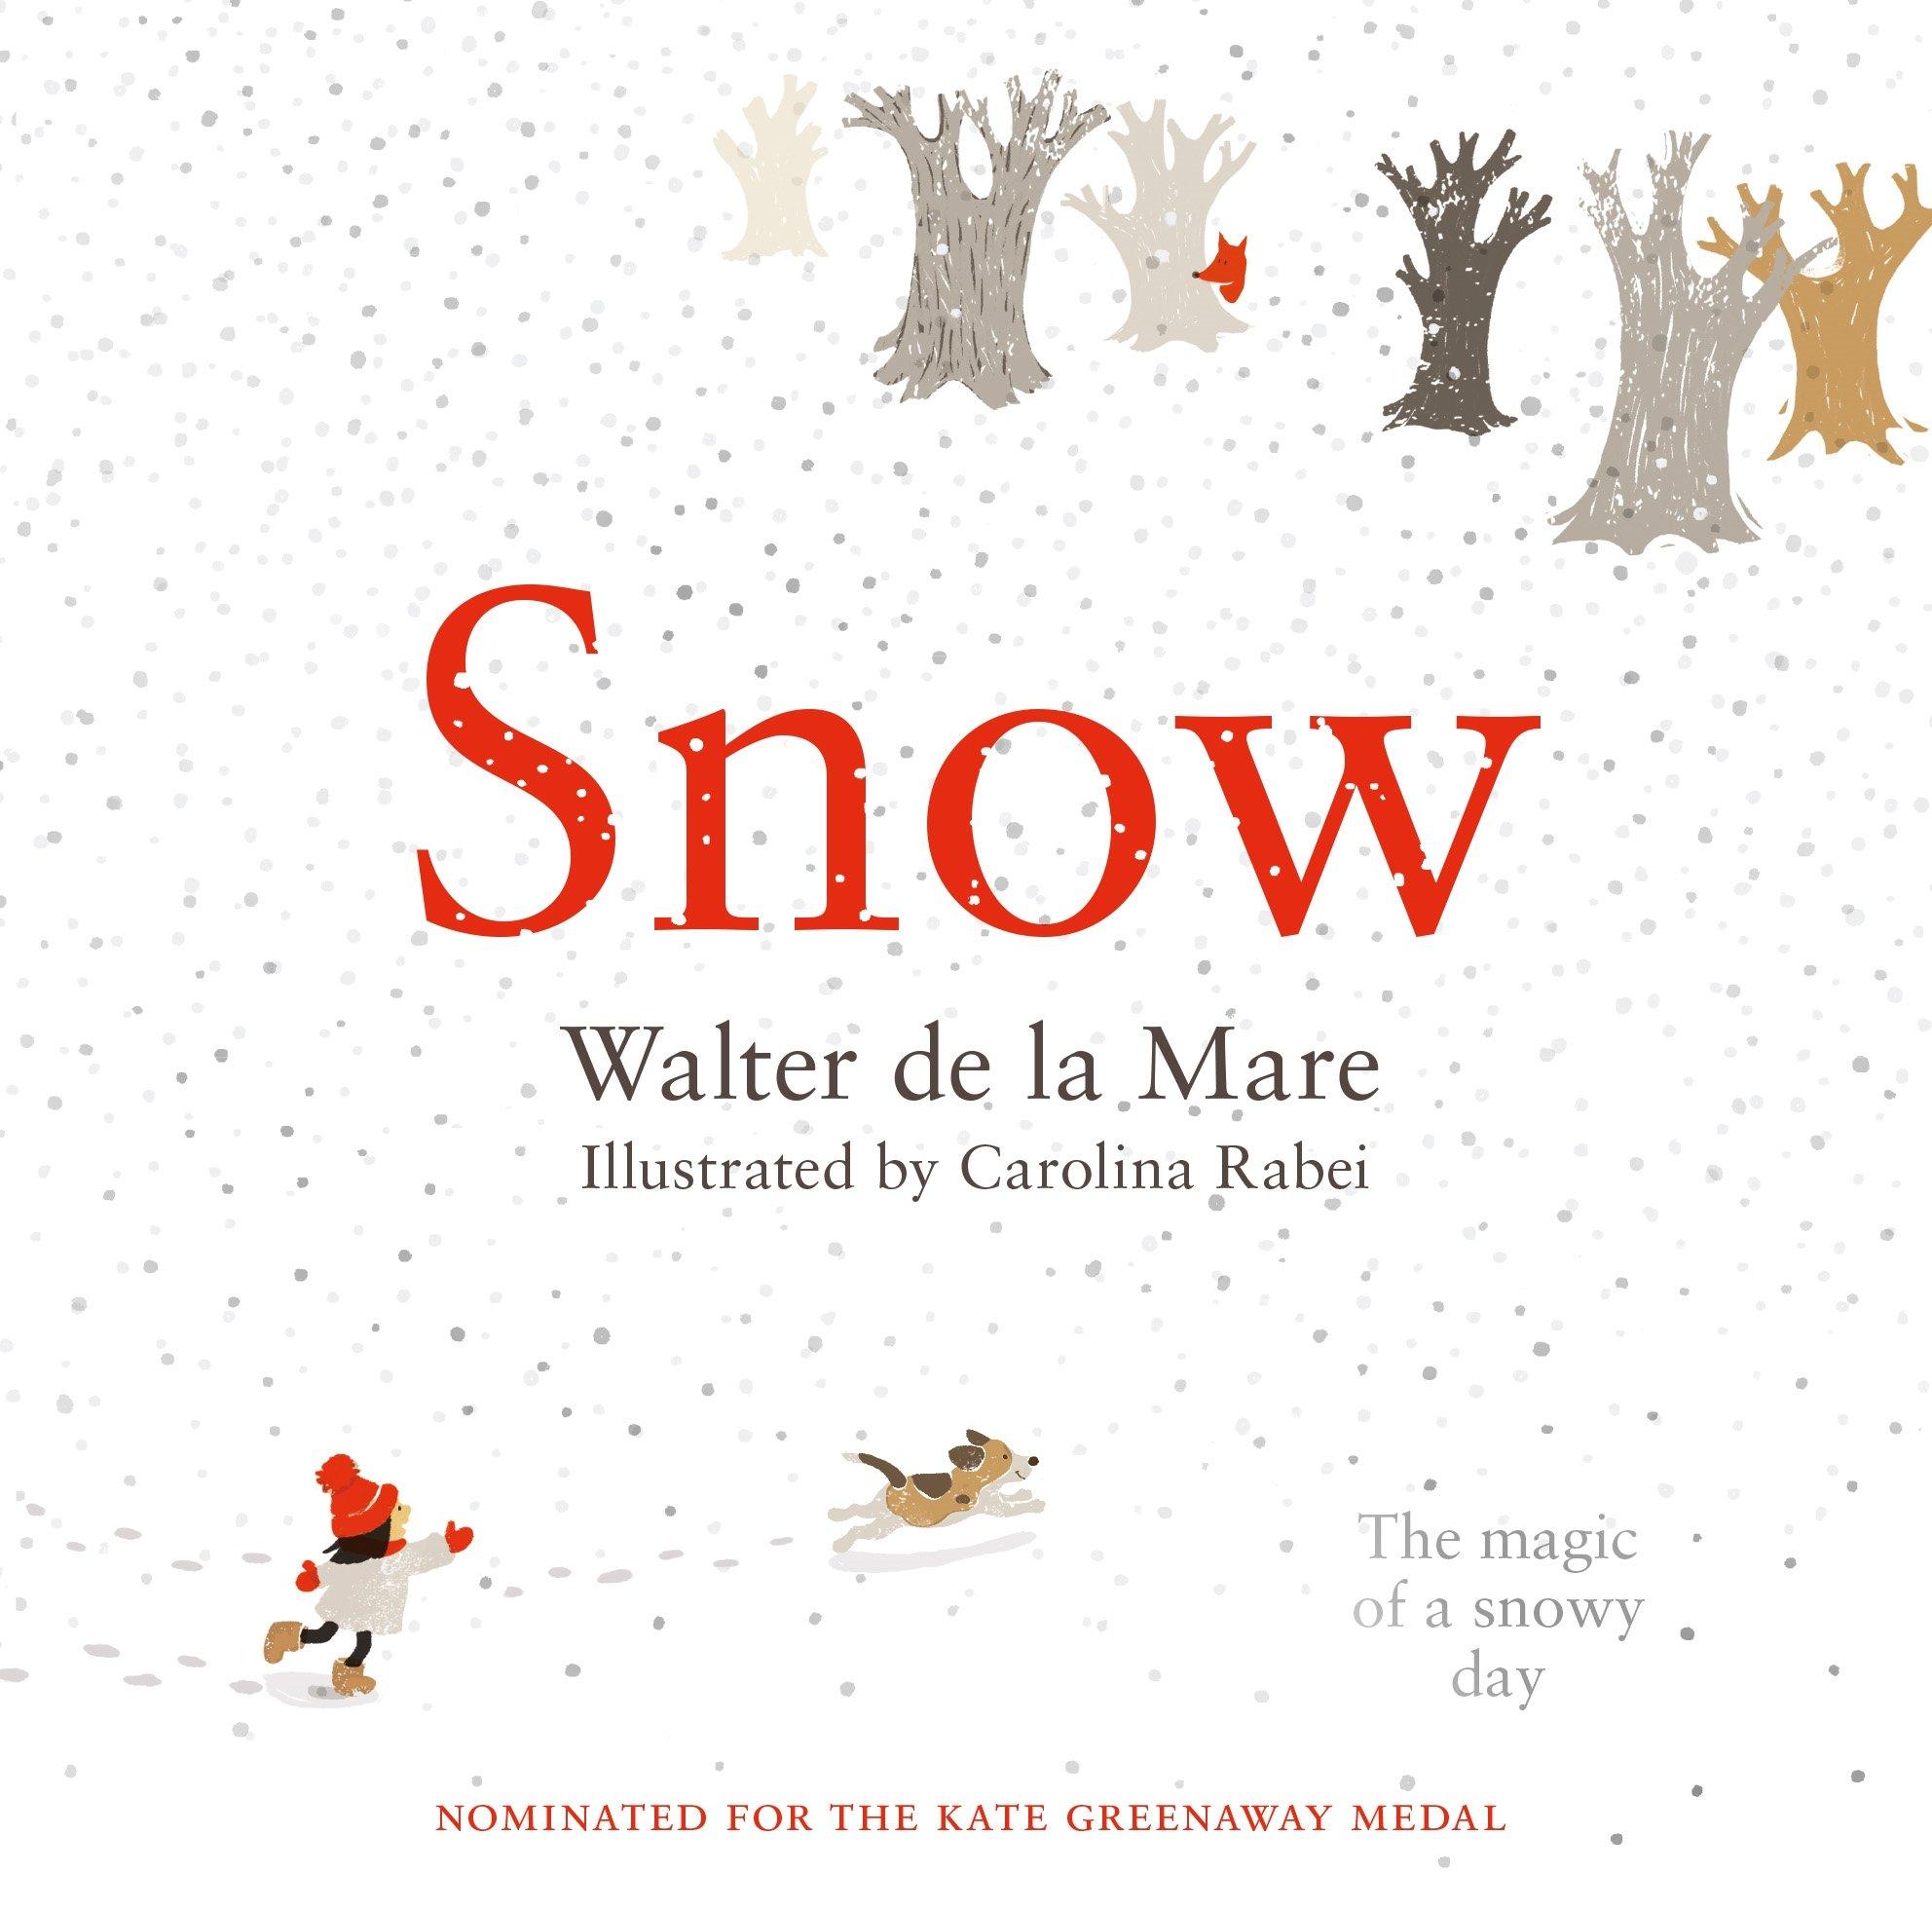 Snow (Four Seasons of Walter de la Mare): Amazon.co.uk: de la Mare, Walter,  Rabei, Carolina: 9780571337132: Books